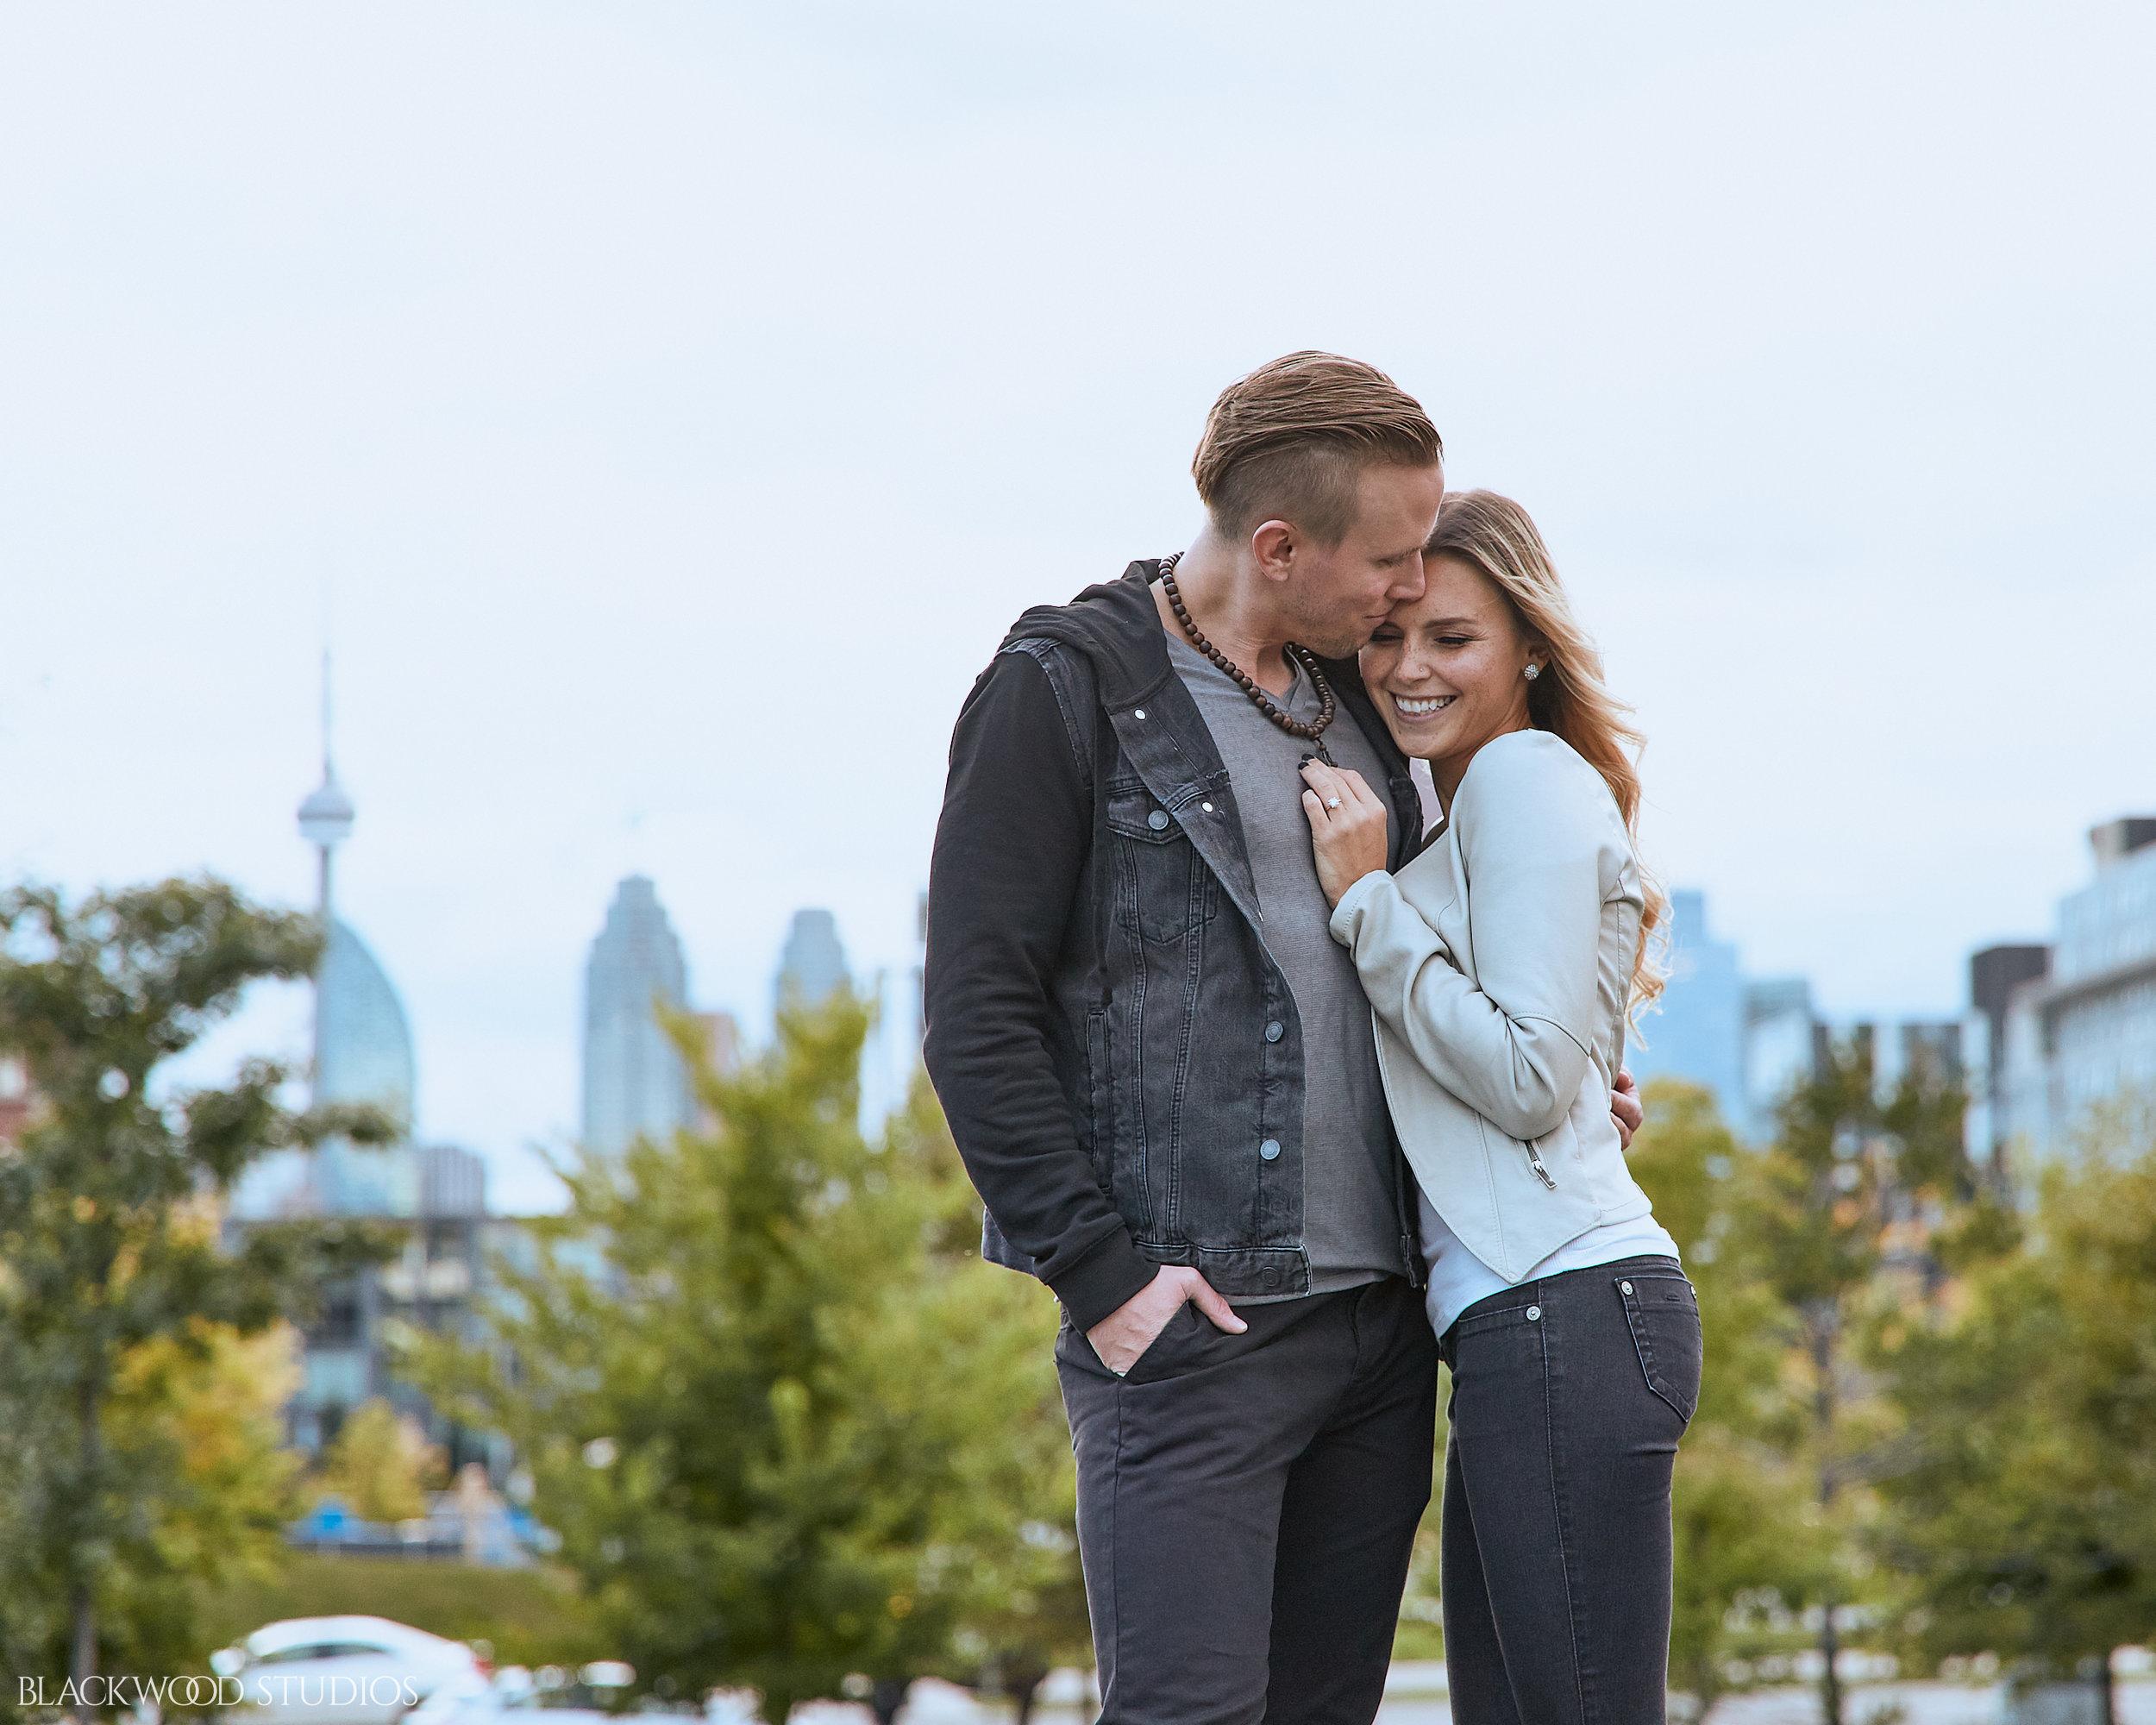 Blackwood-Studios-20181012-181256-Aleisha-and-Brad-Engagement-photography-Toronto-Ontario-Canada-Corktown-Common.jpg